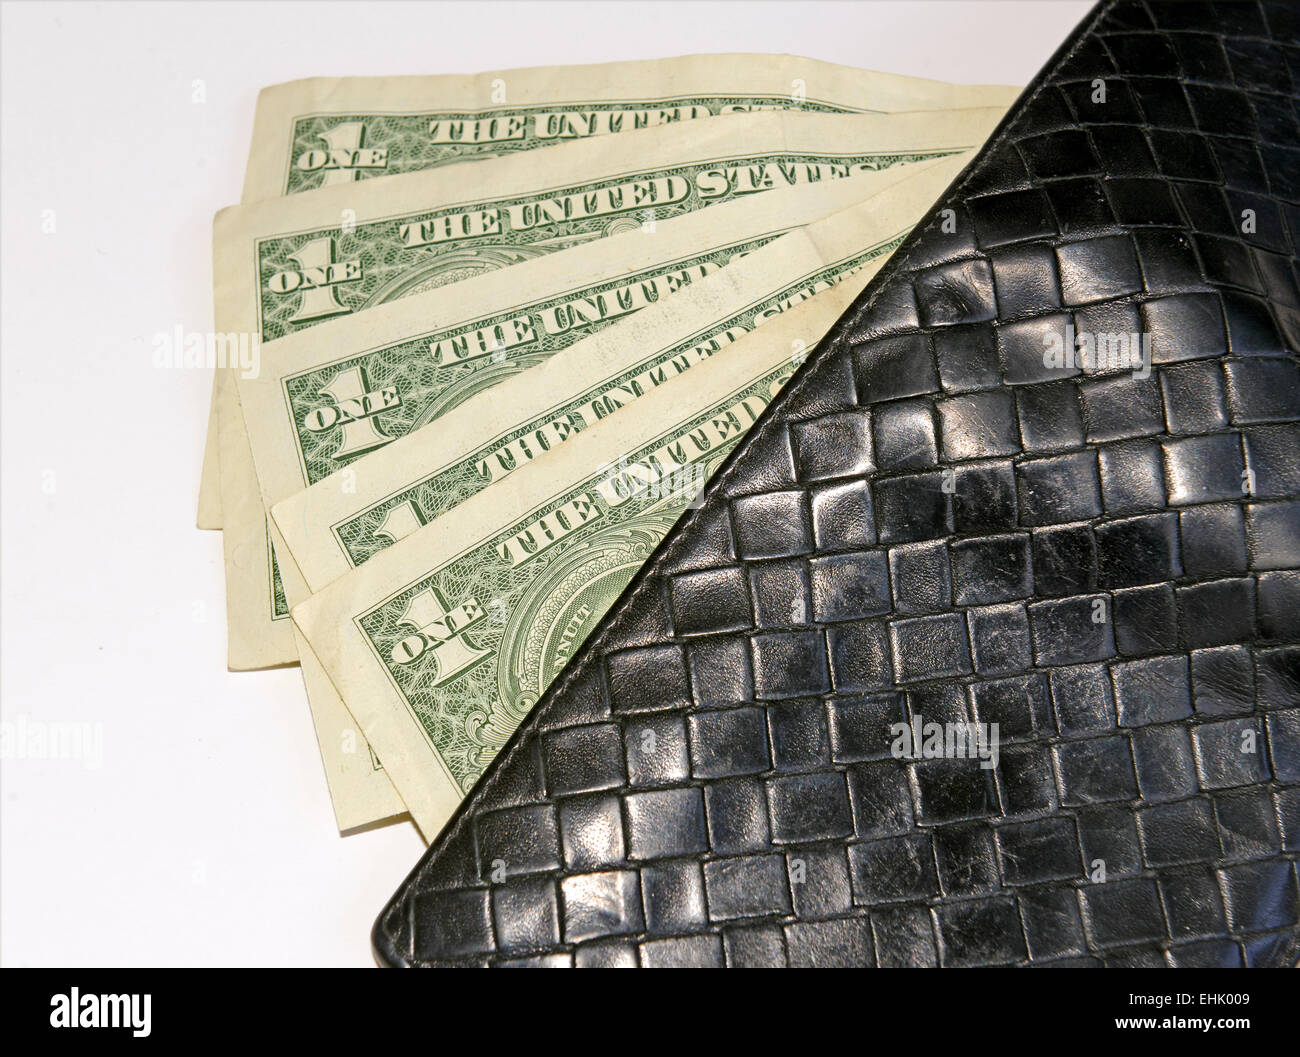 US dollar bills currency - Stock Image